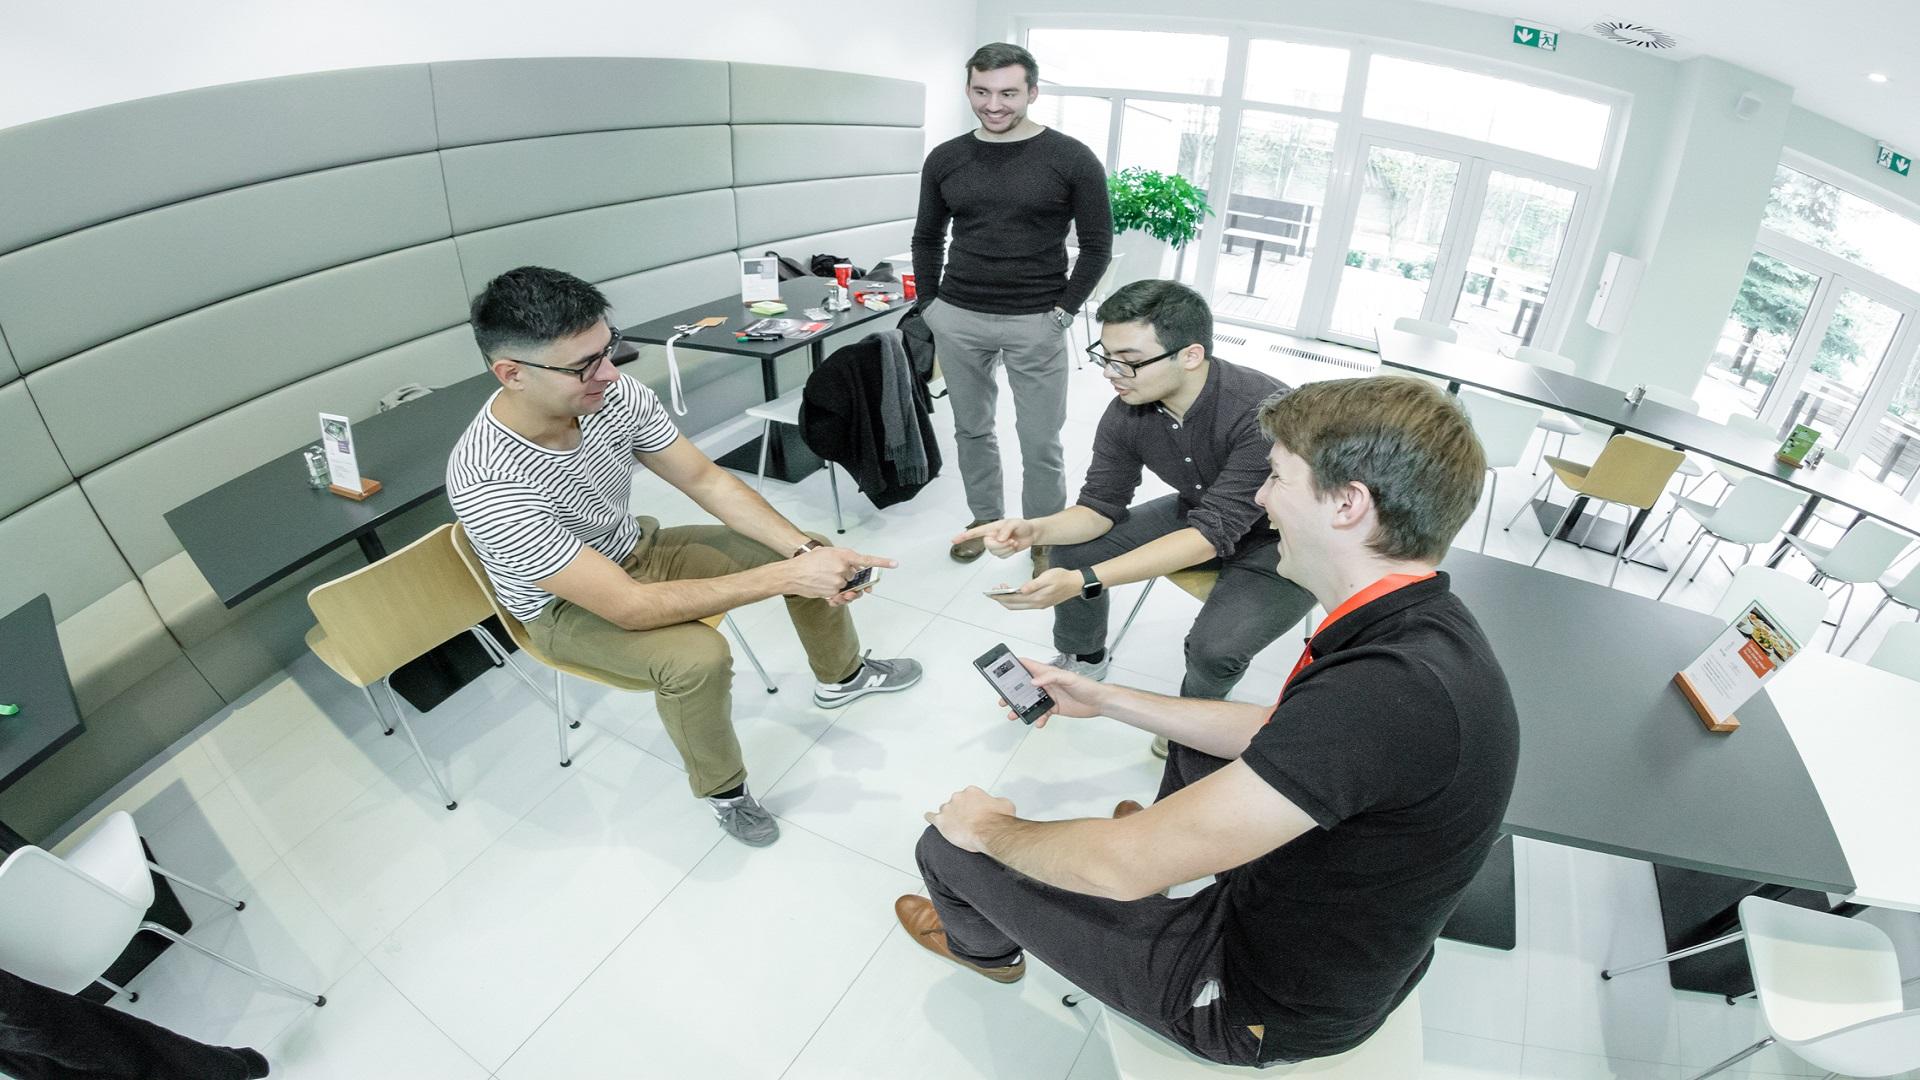 image-prazsky-smart-energy-hackaton-zna-sveho-viteze-mezinarodni-programatorsky-maraton-vyhral-cesko-nemecky-tym